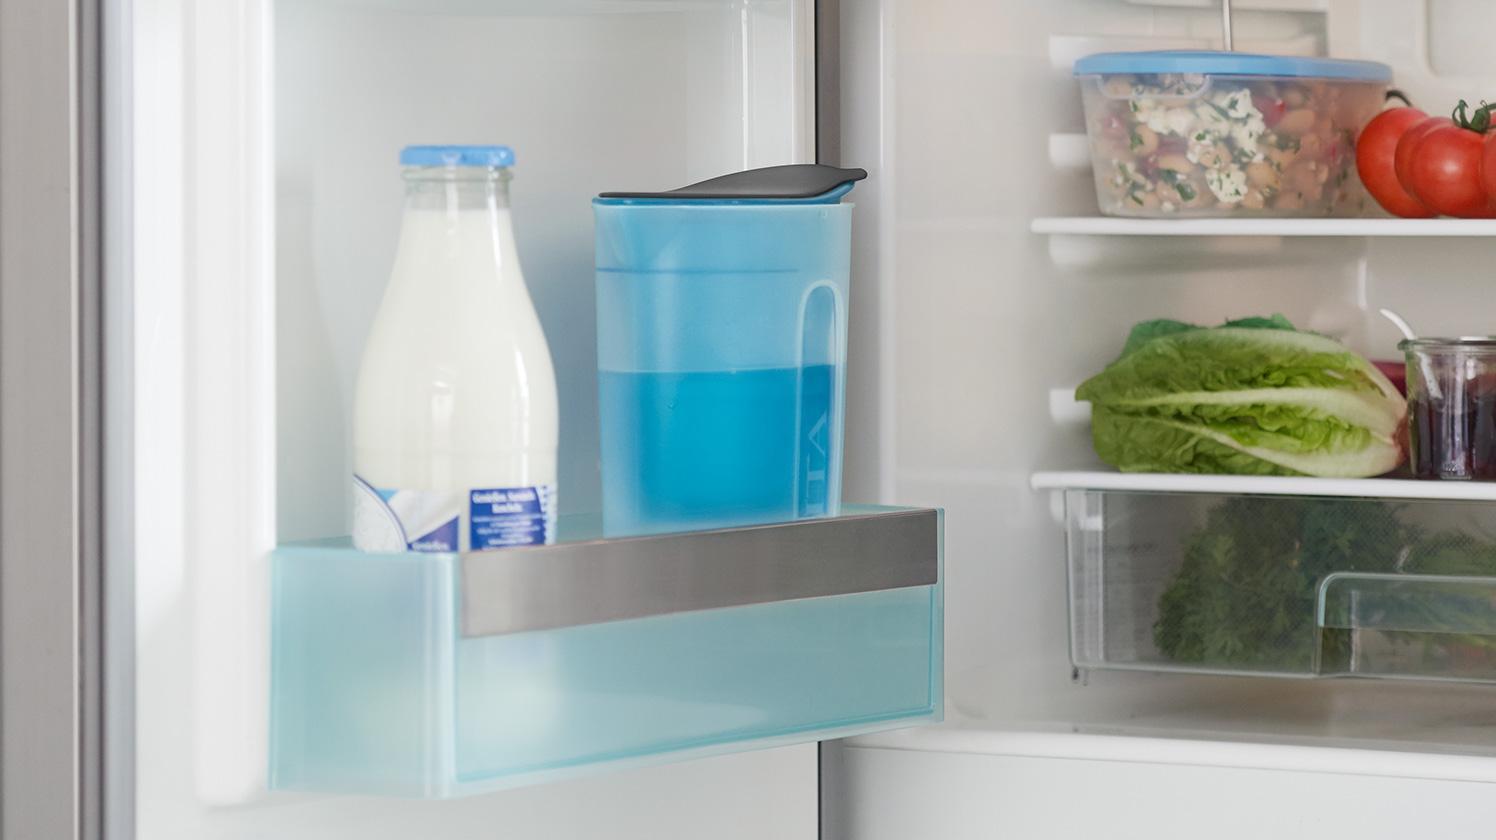 BRITA fill&enjoy Fun blue kitchen fridge